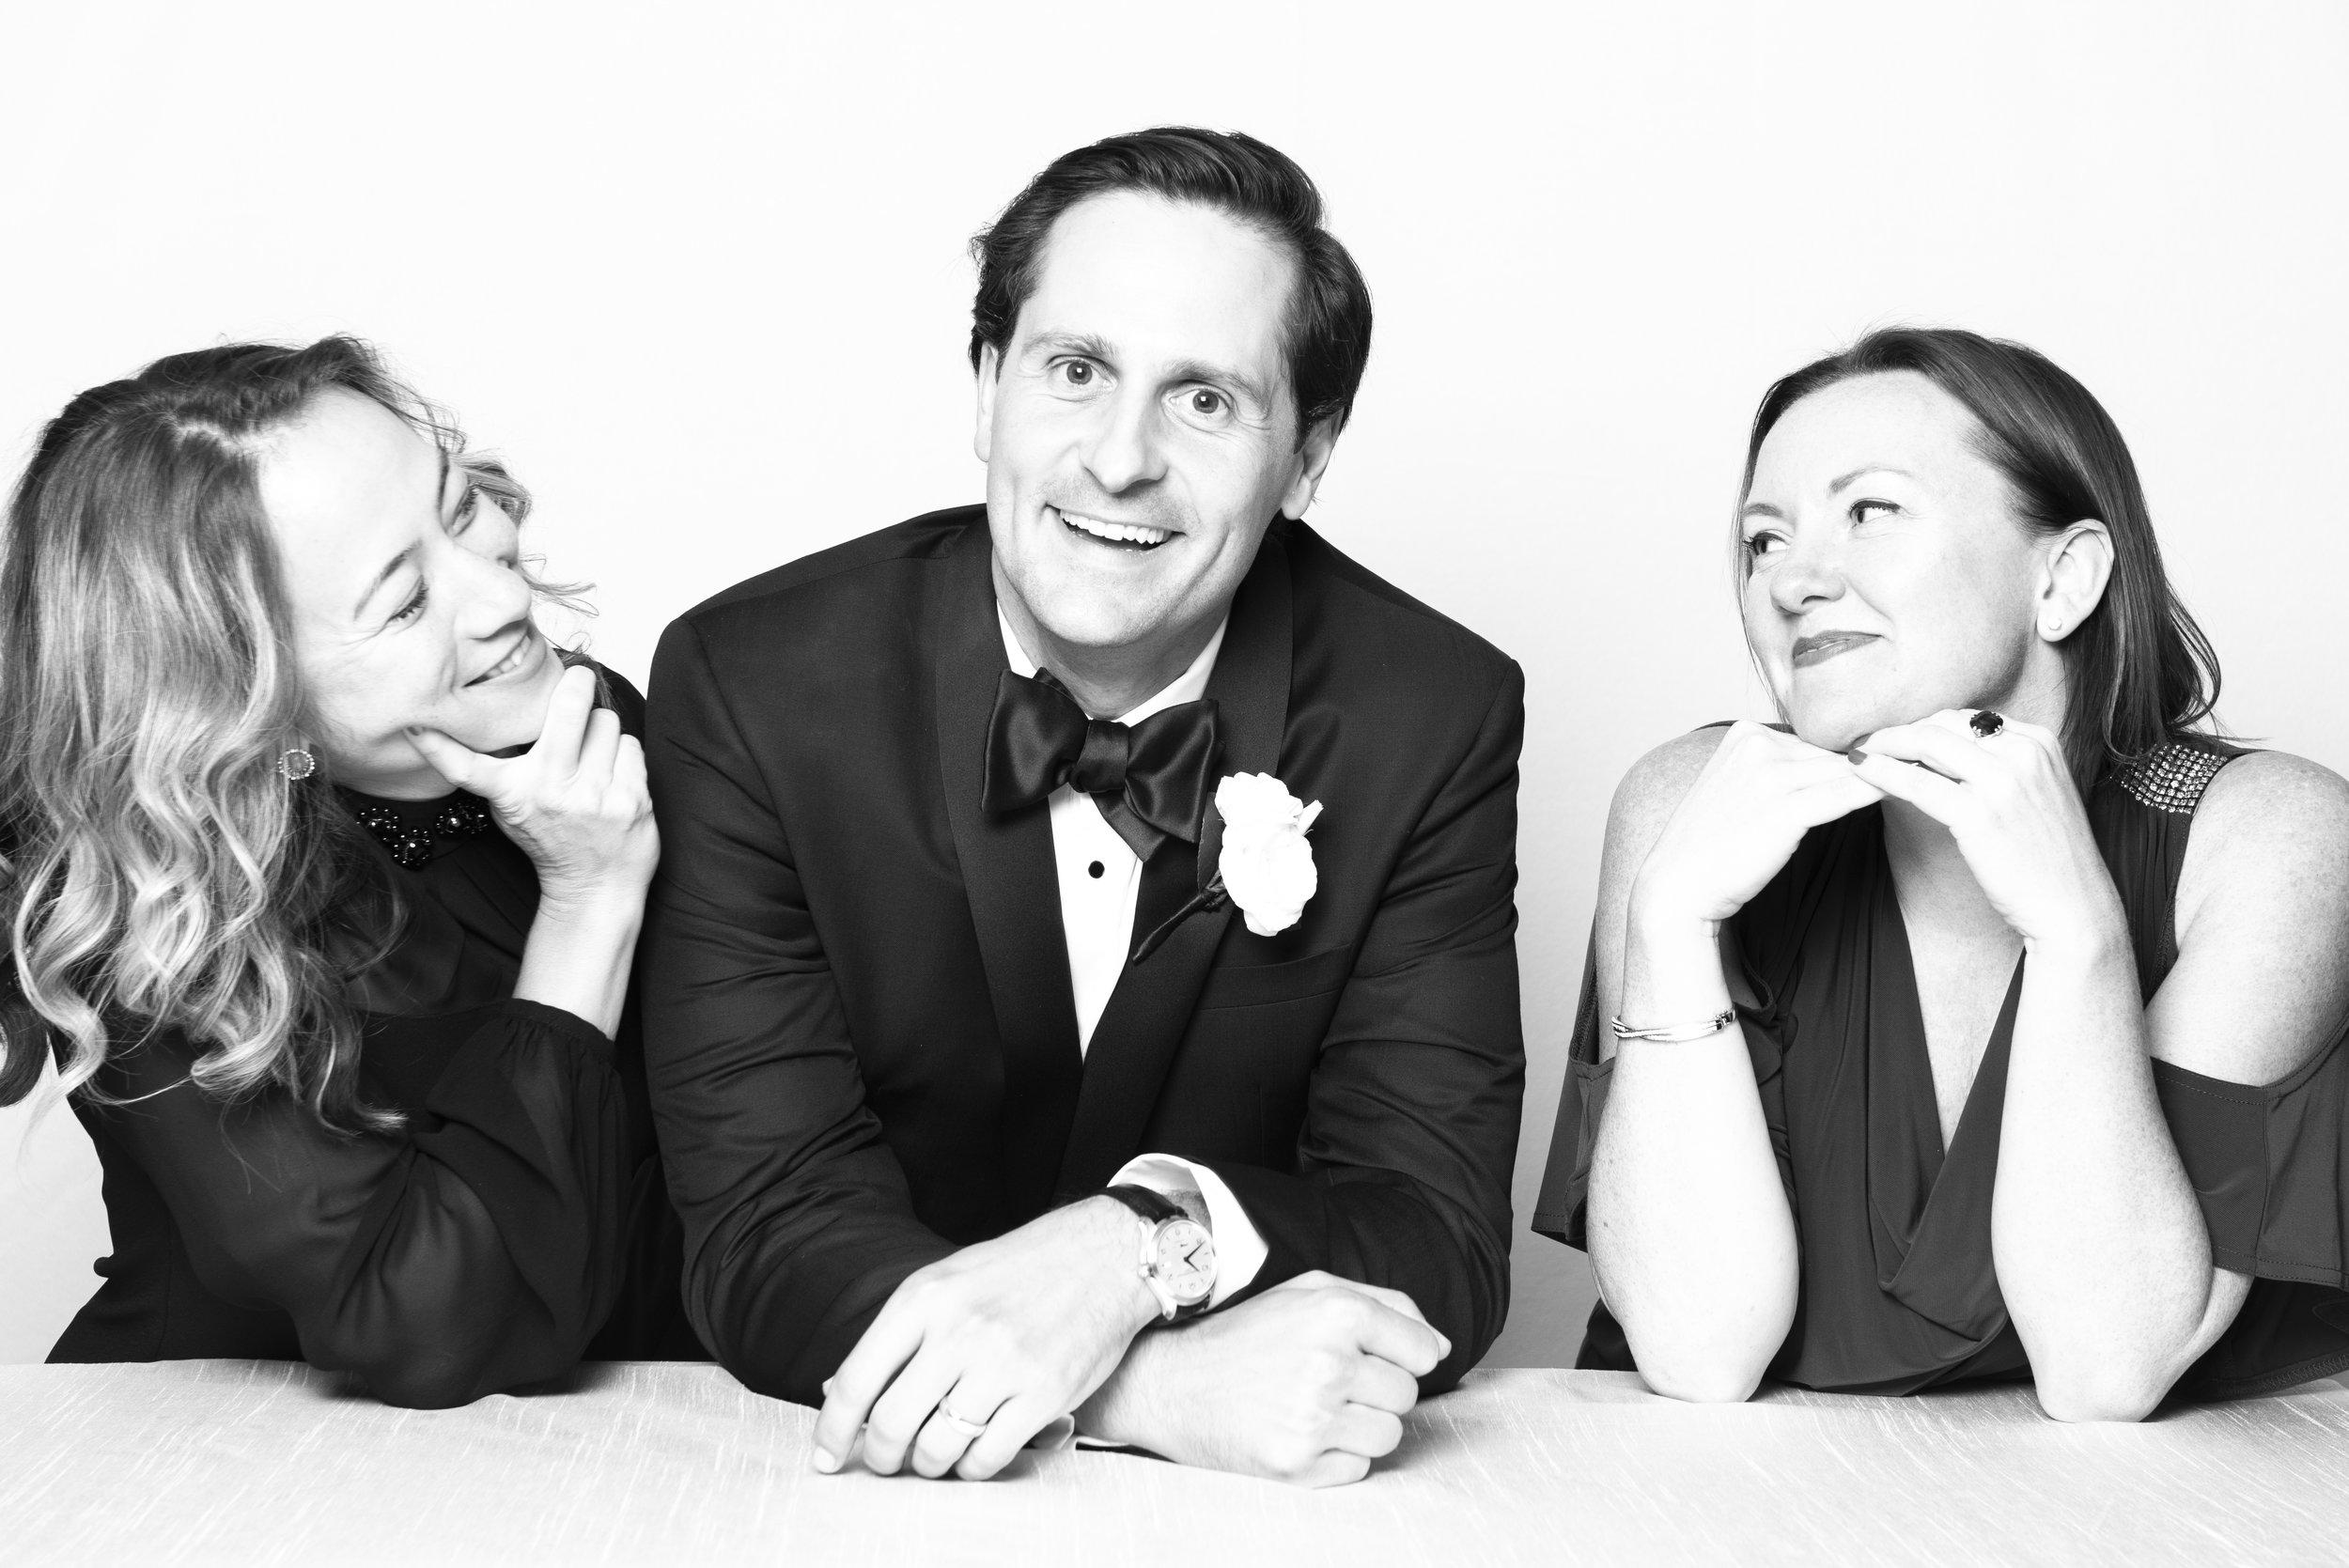 5ive15ifteen-515-Toronto-Wedding-Photographer-Portrait Booth-23.jpg